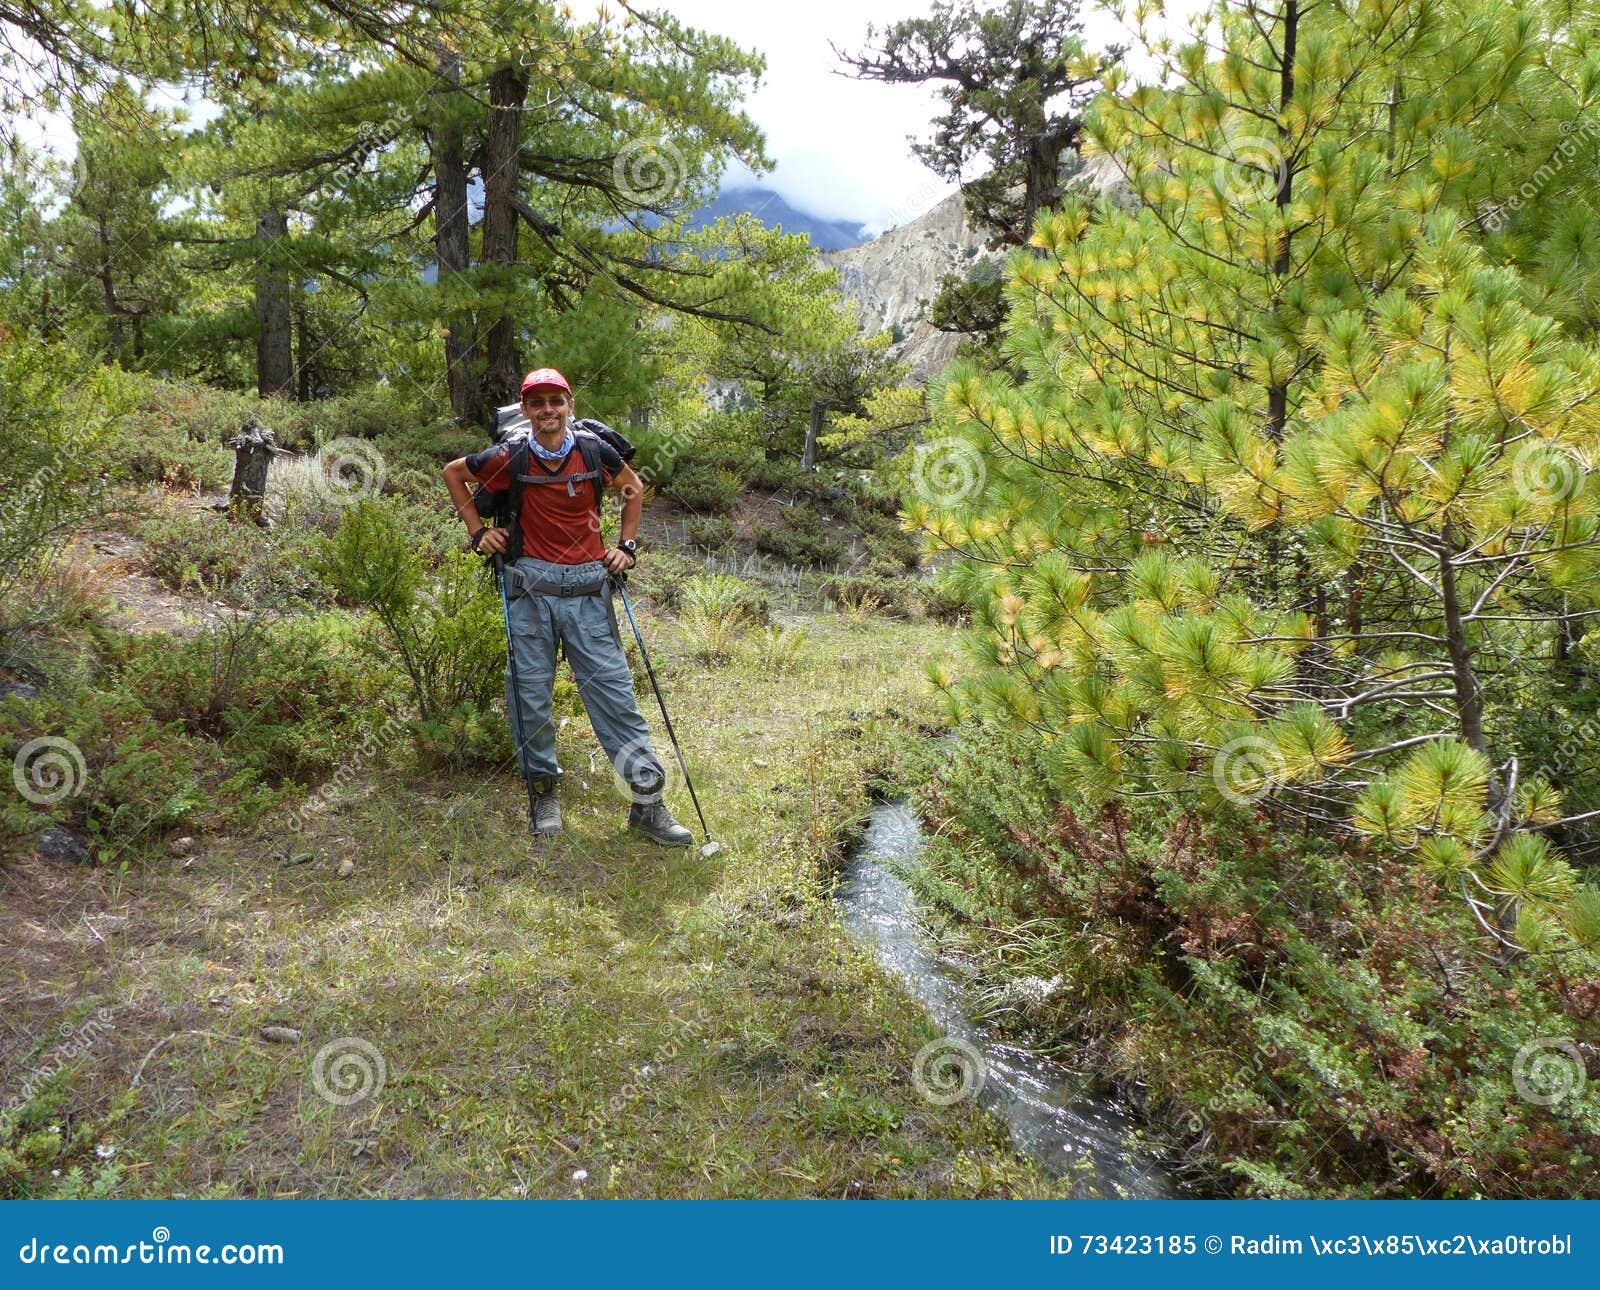 Pathway through pine forest